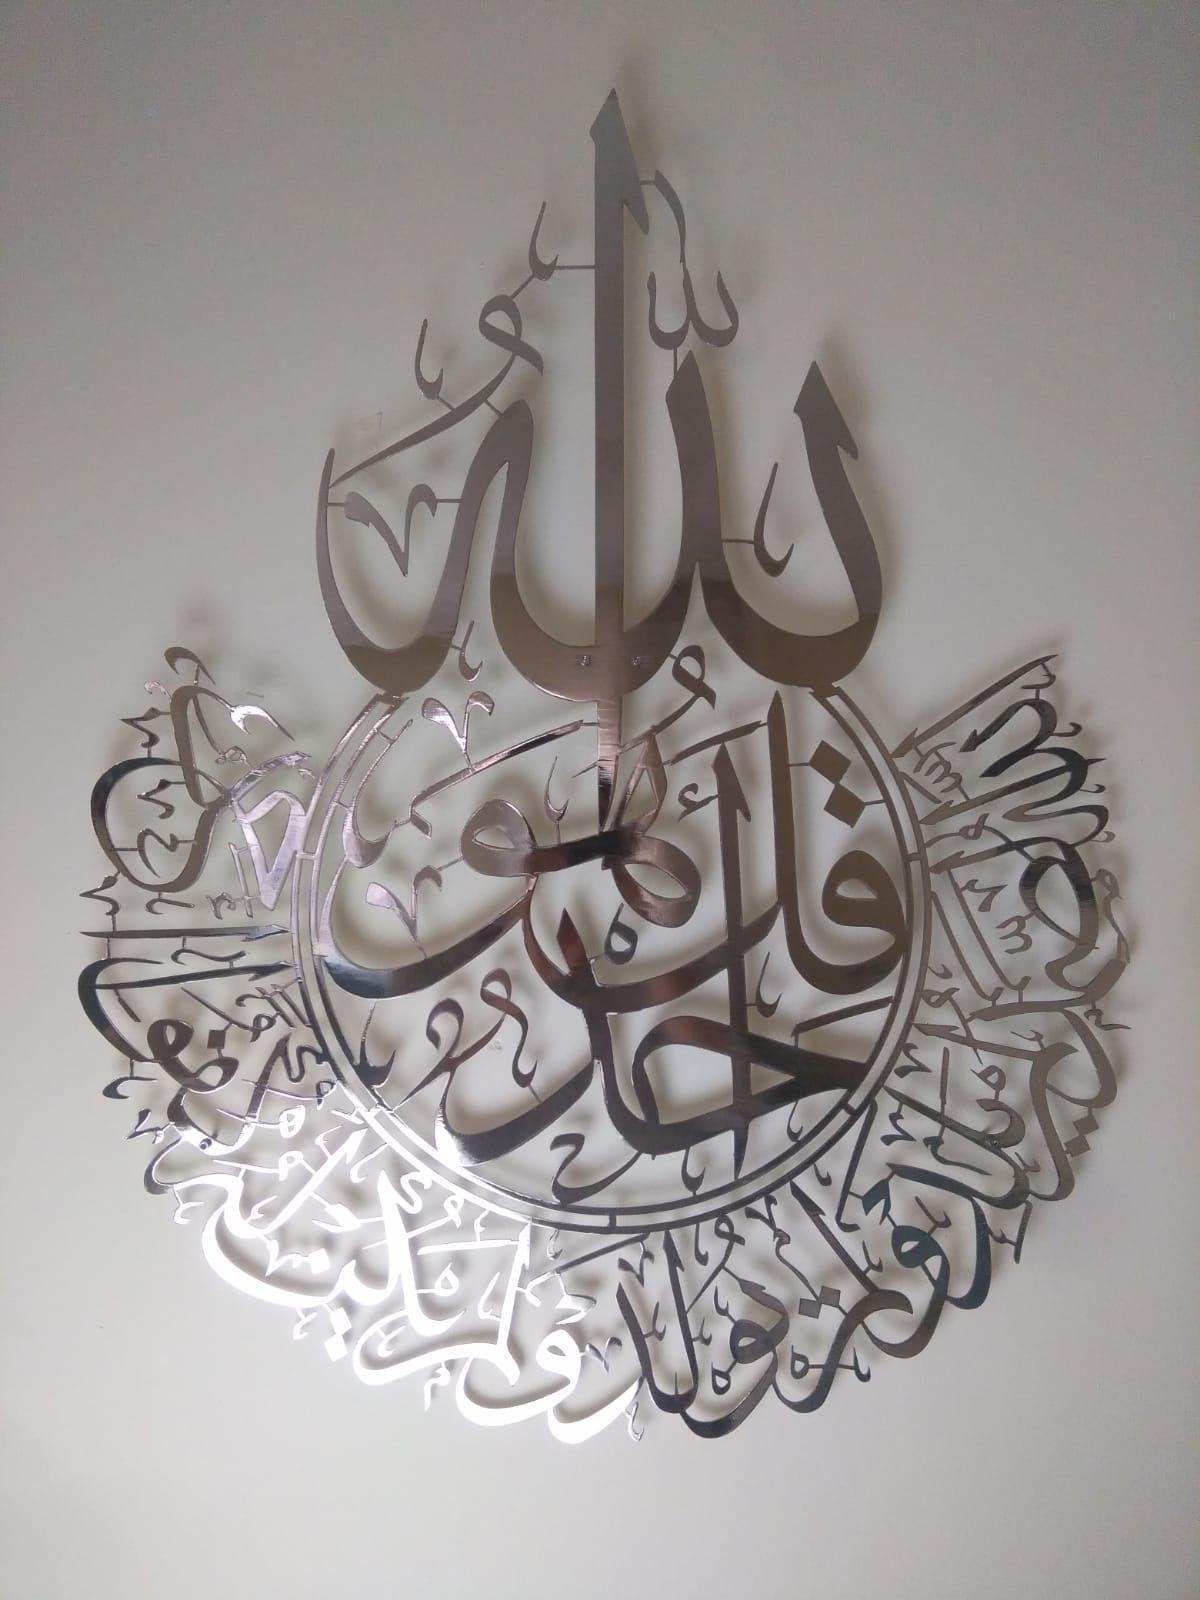 Islamic Wall Art Extra Large Surah Al Ikhlas Shiny Silver